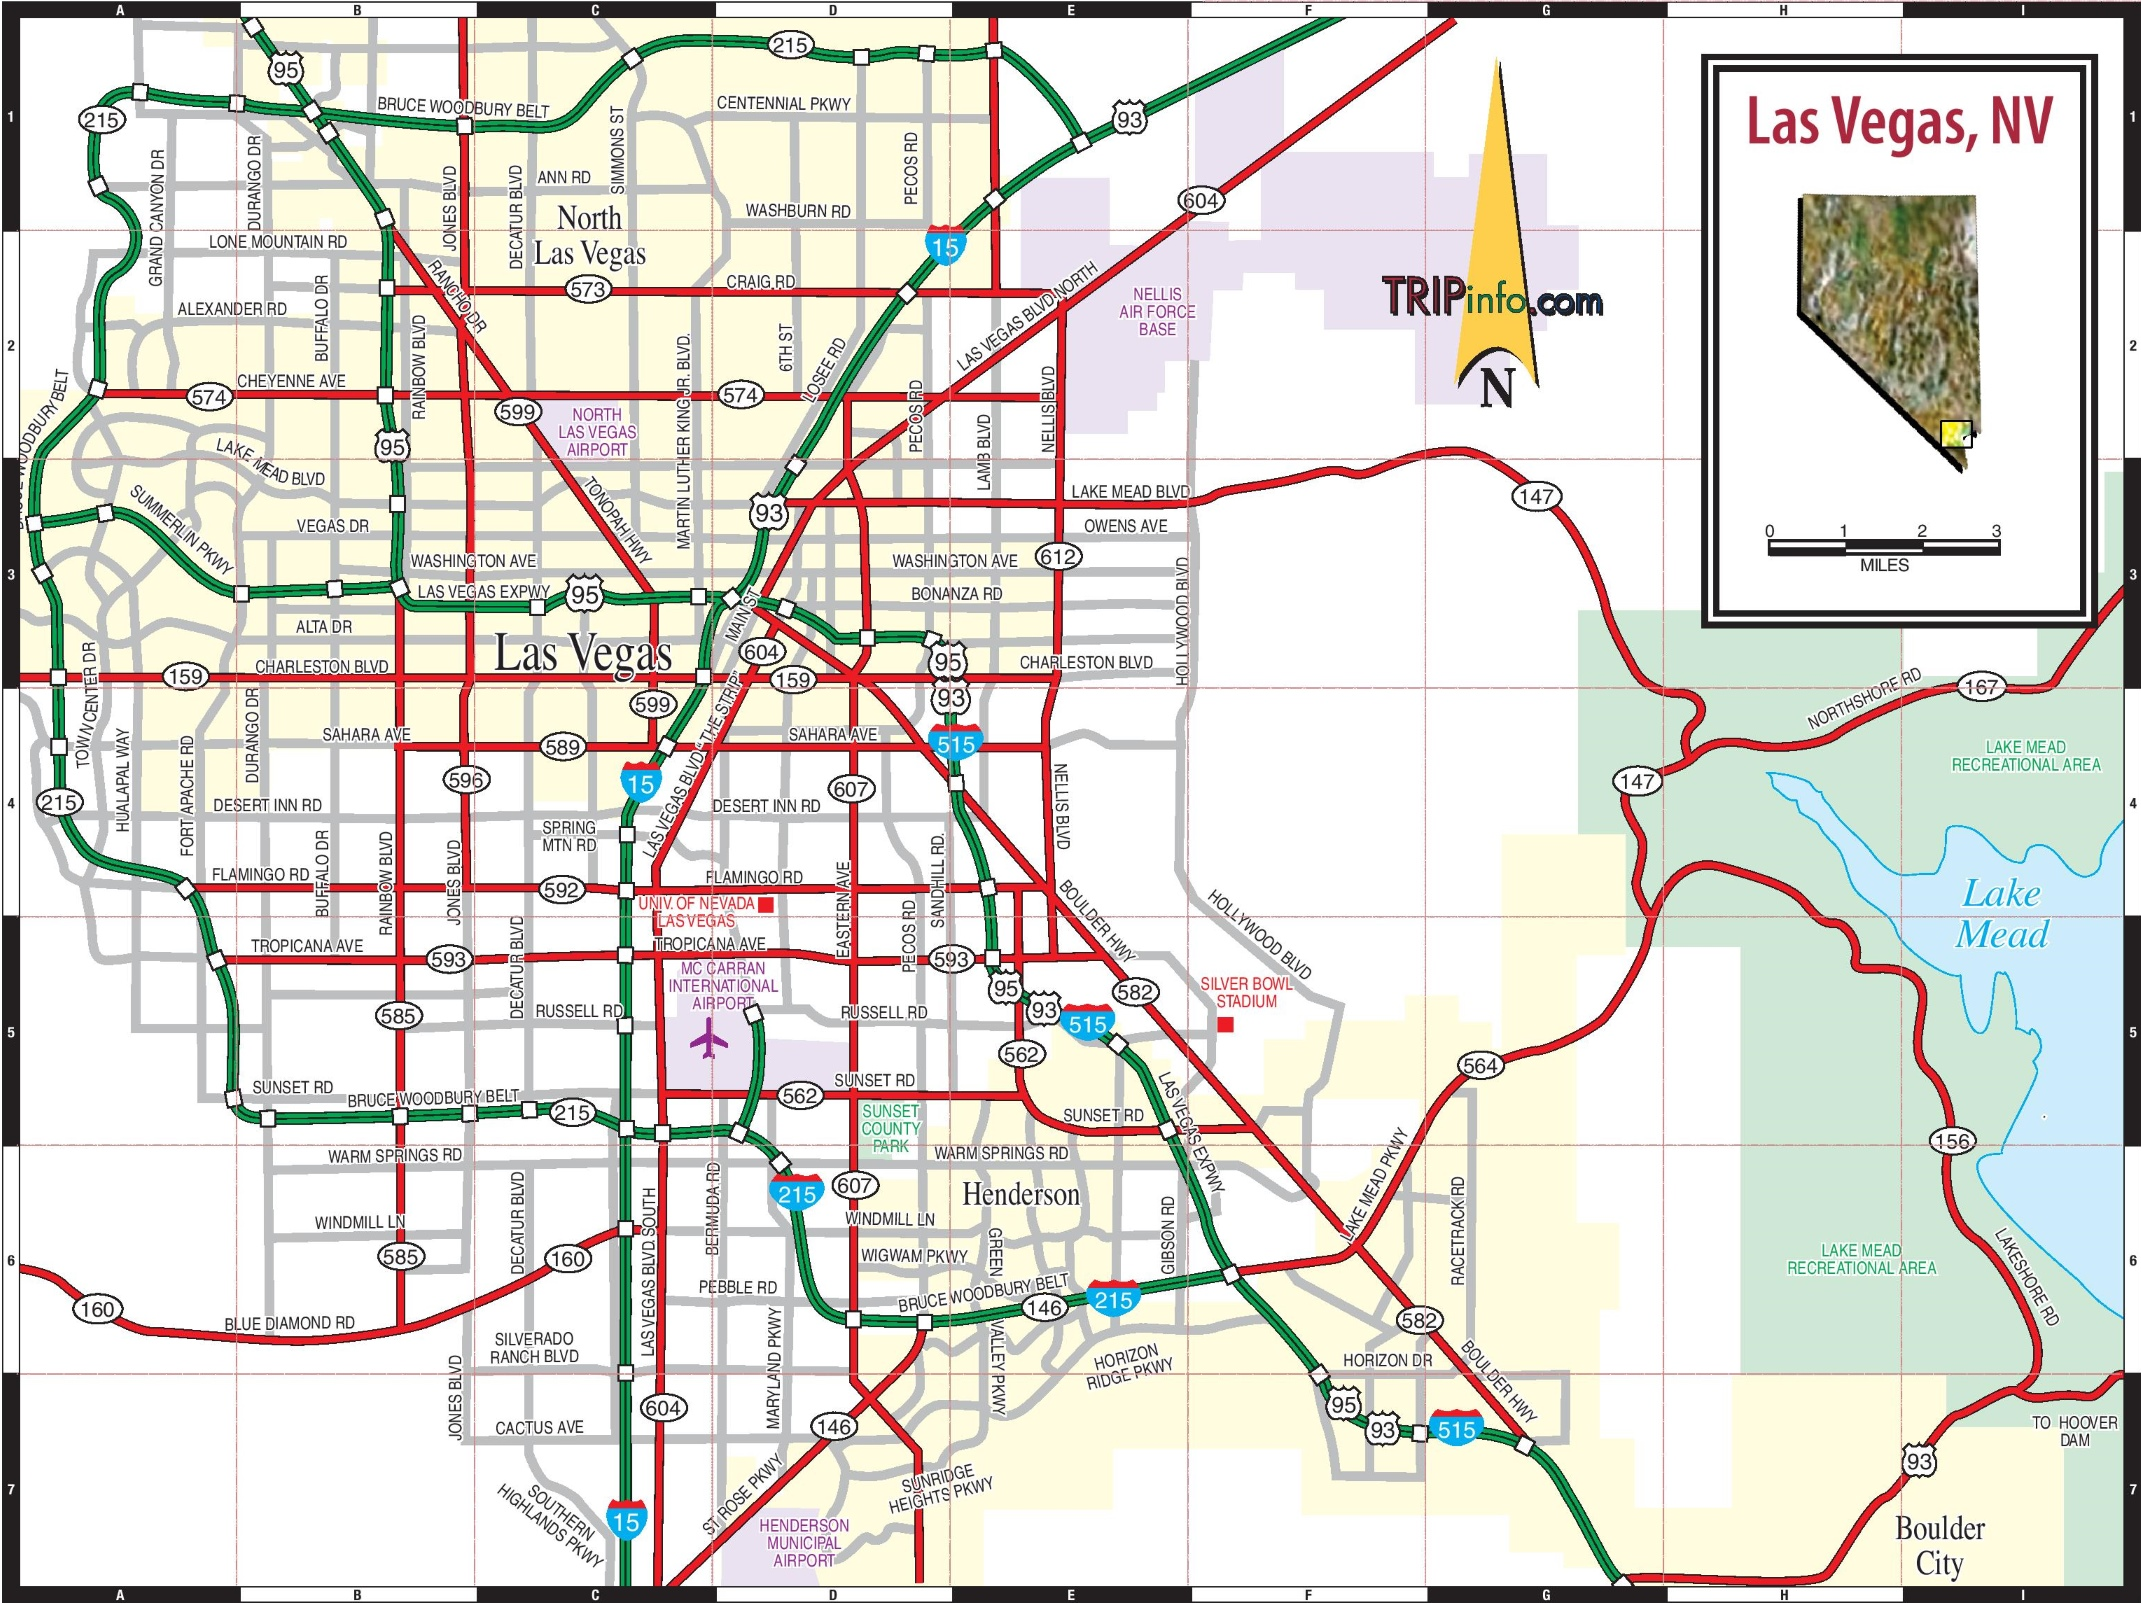 Las Vegas City Map Las Vegas road map Las Vegas City Map